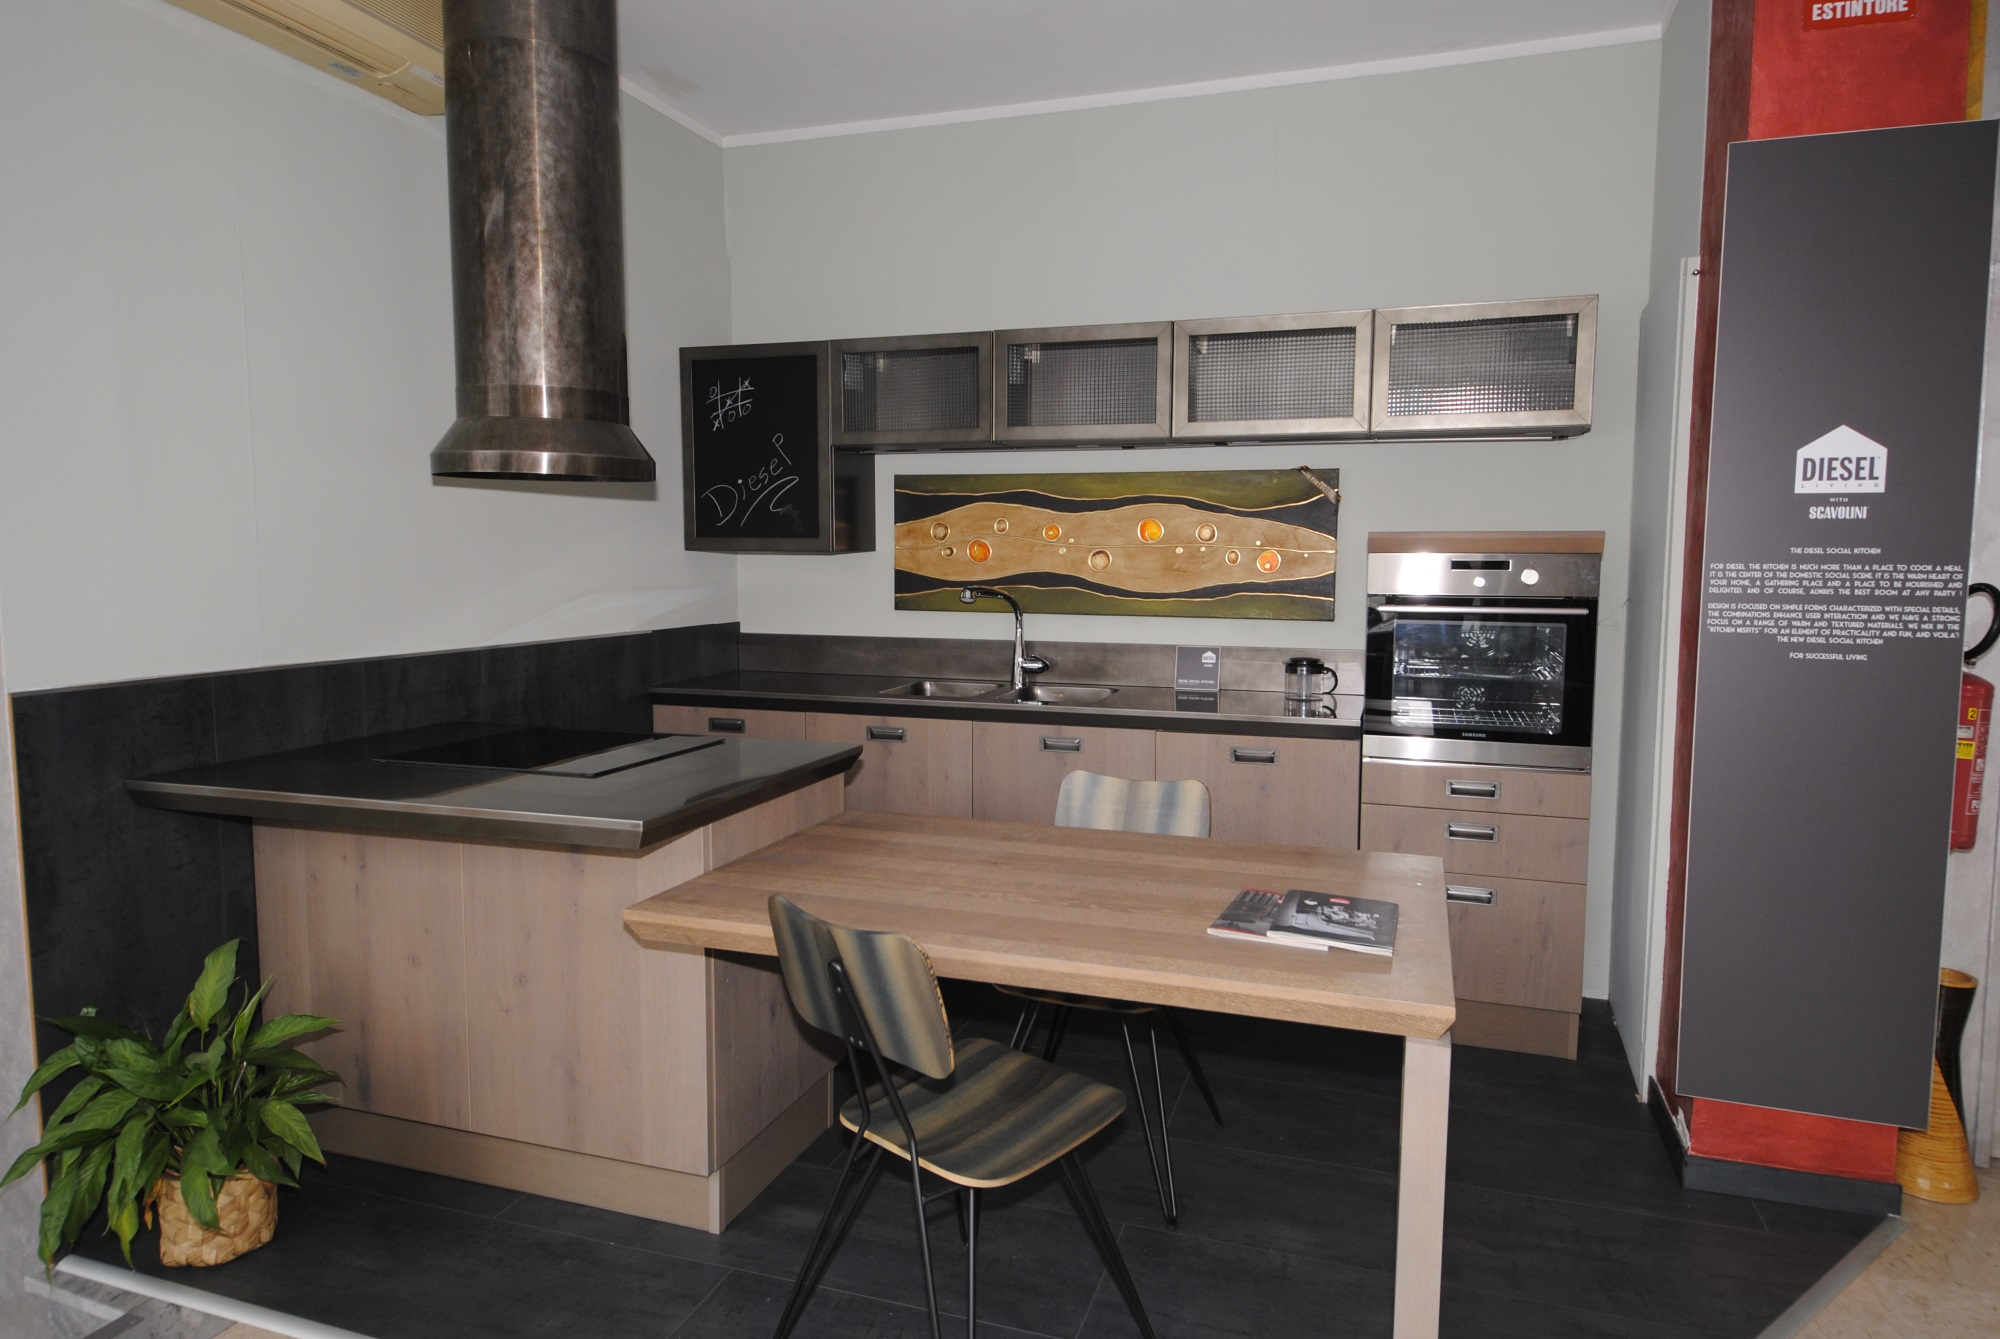 Offerta Cucina Scavolini modello Diesel Social Kitchen - San ...